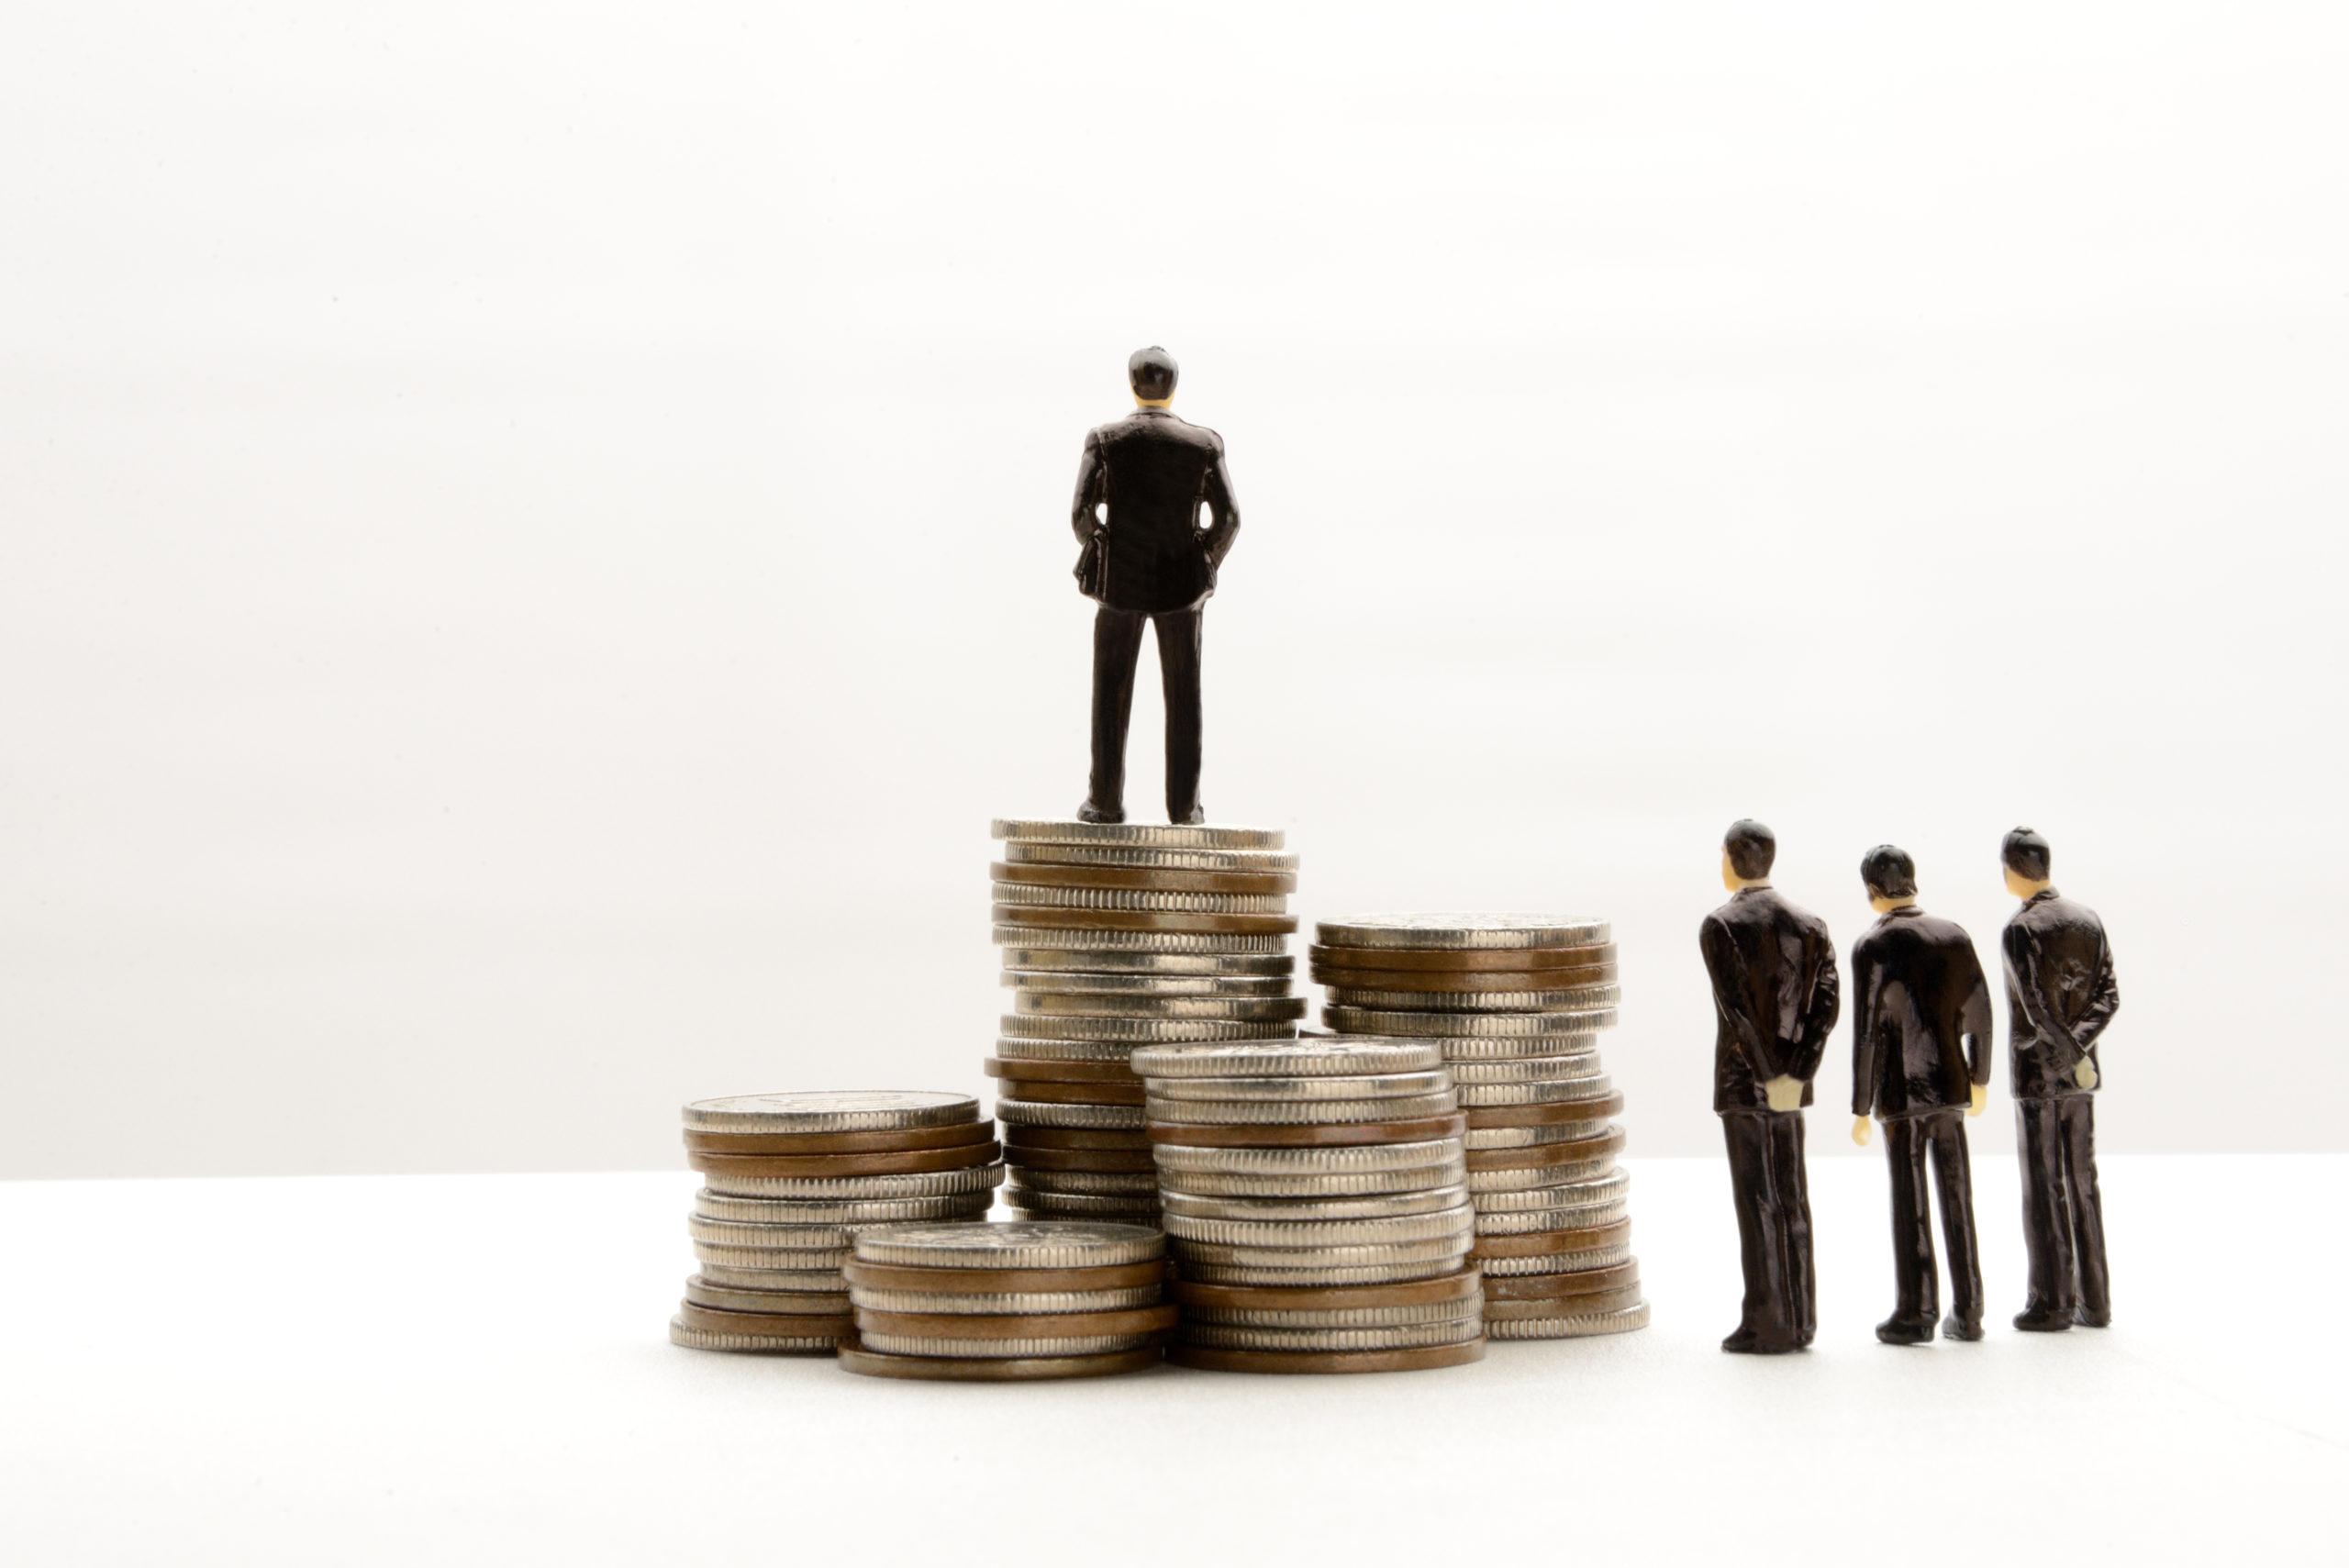 business-concepts-income-gap-1119742850